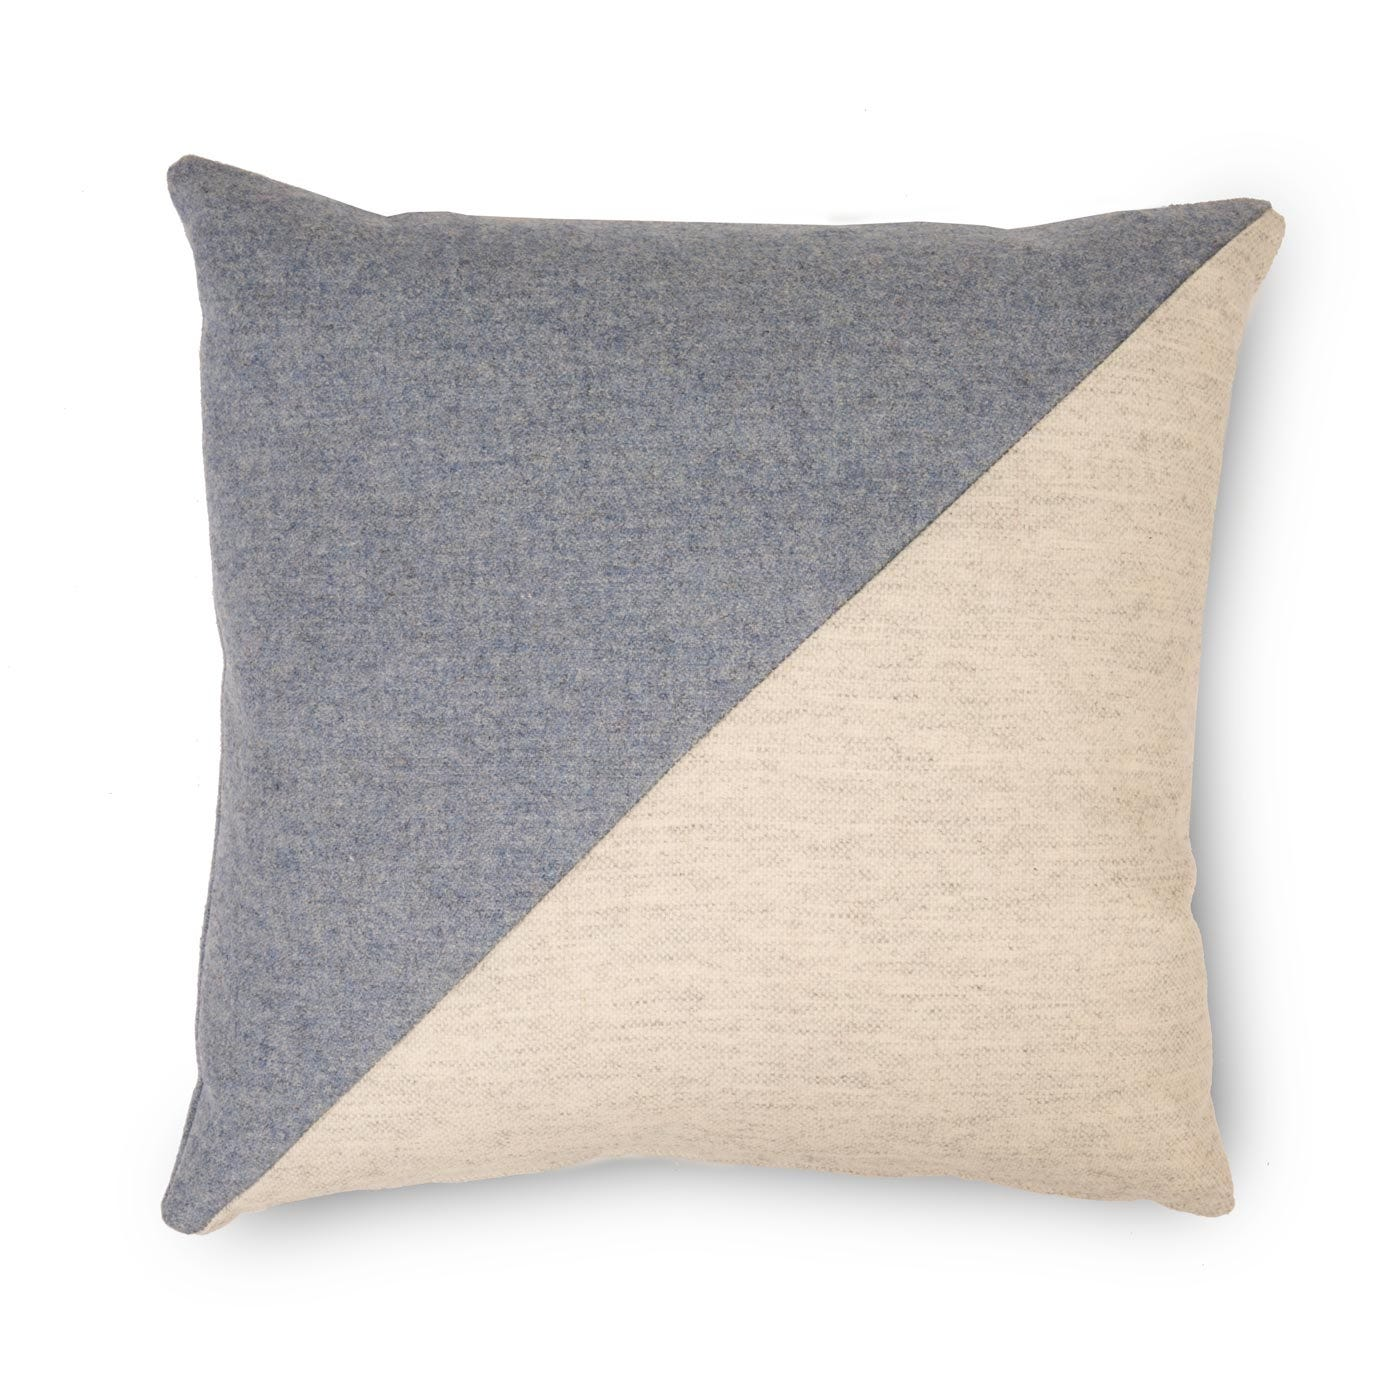 Lana Patchwork Cushion 45cm x 45cm